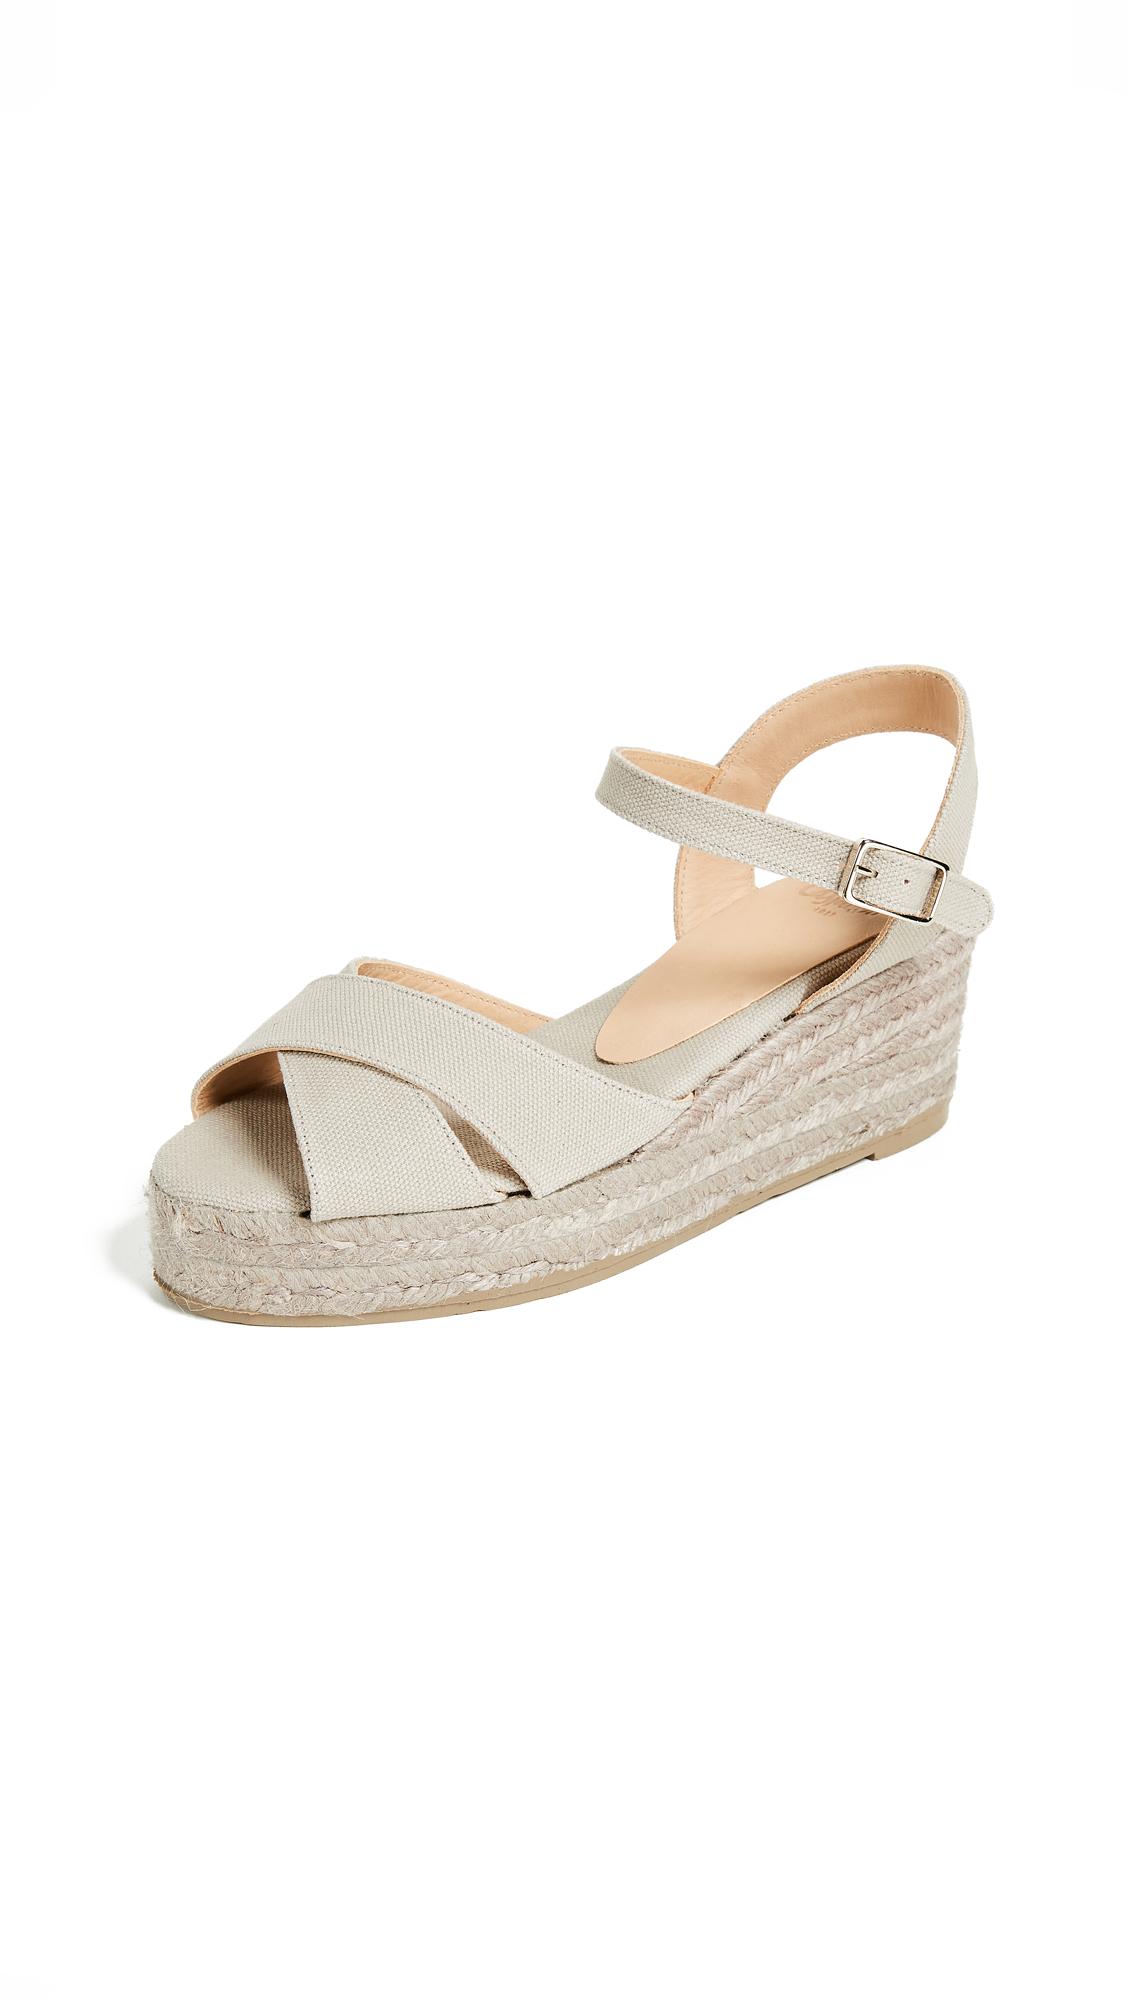 Castaner Blaudell Crisscross Wedge Sandals - Piedra/Yute